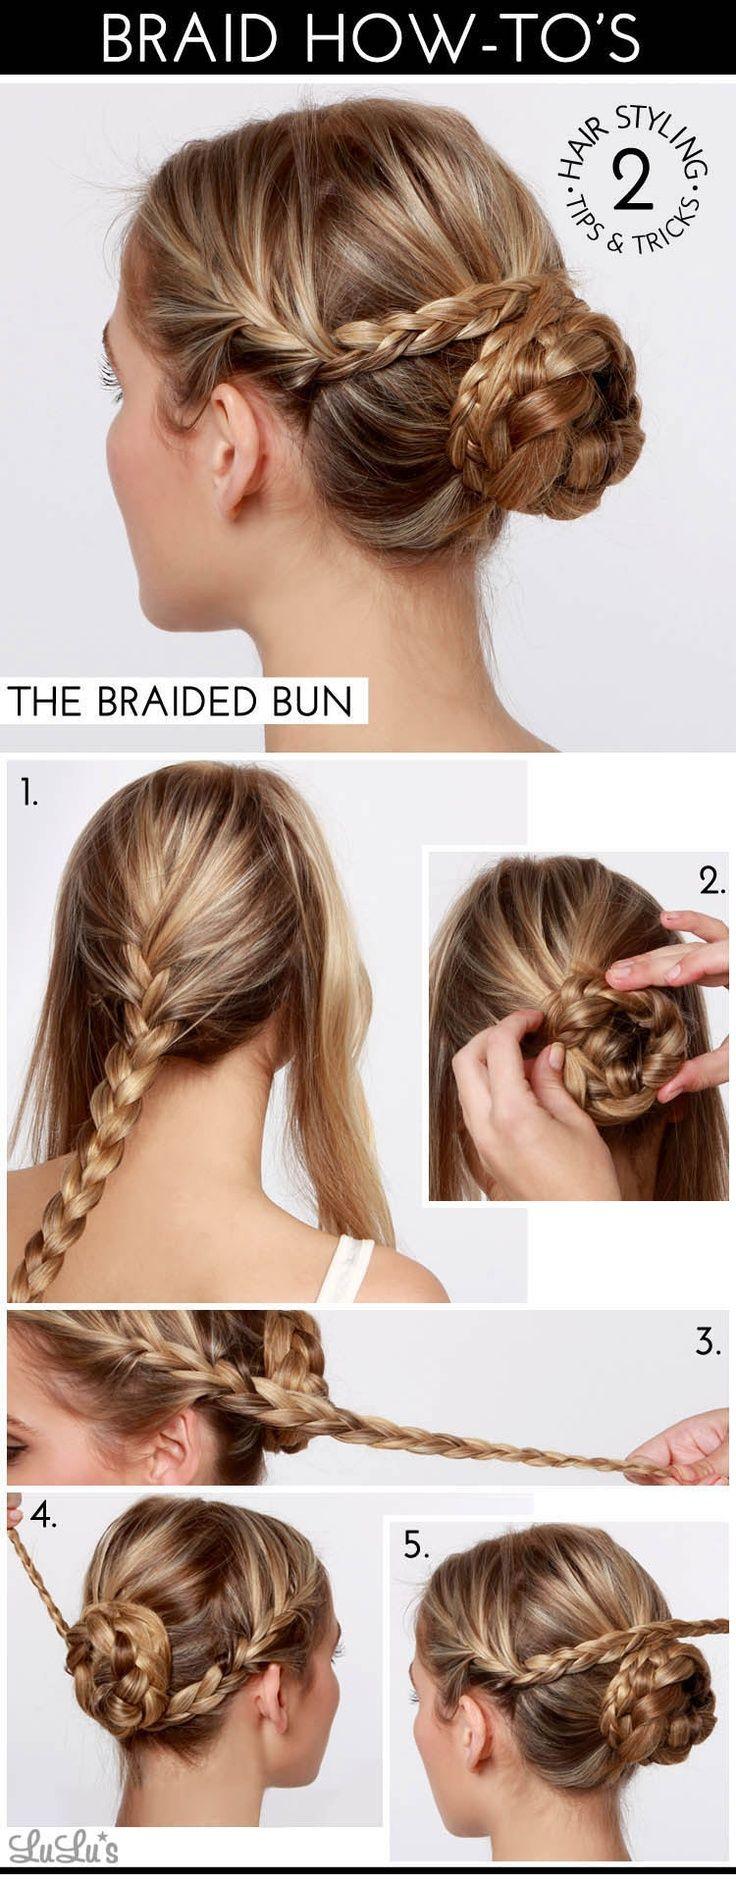 The braided bun | Lulu's Pretty easy and very stylish! hair tutorial bun